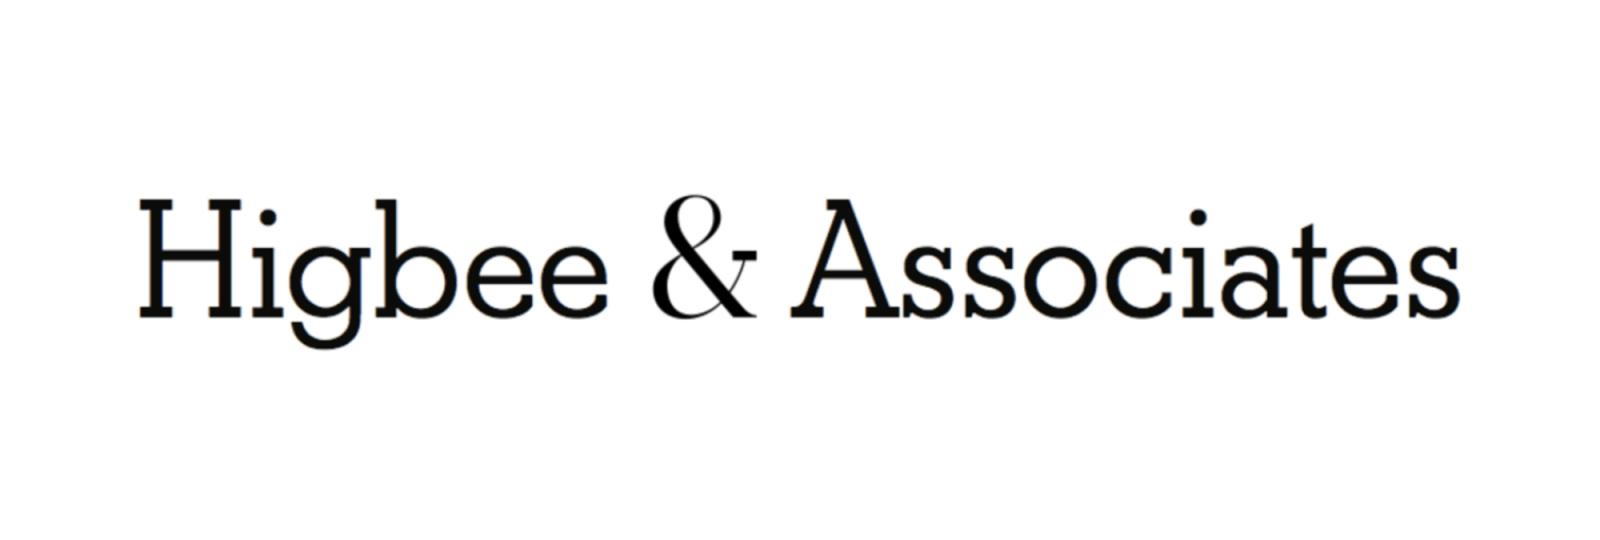 higbee and associates